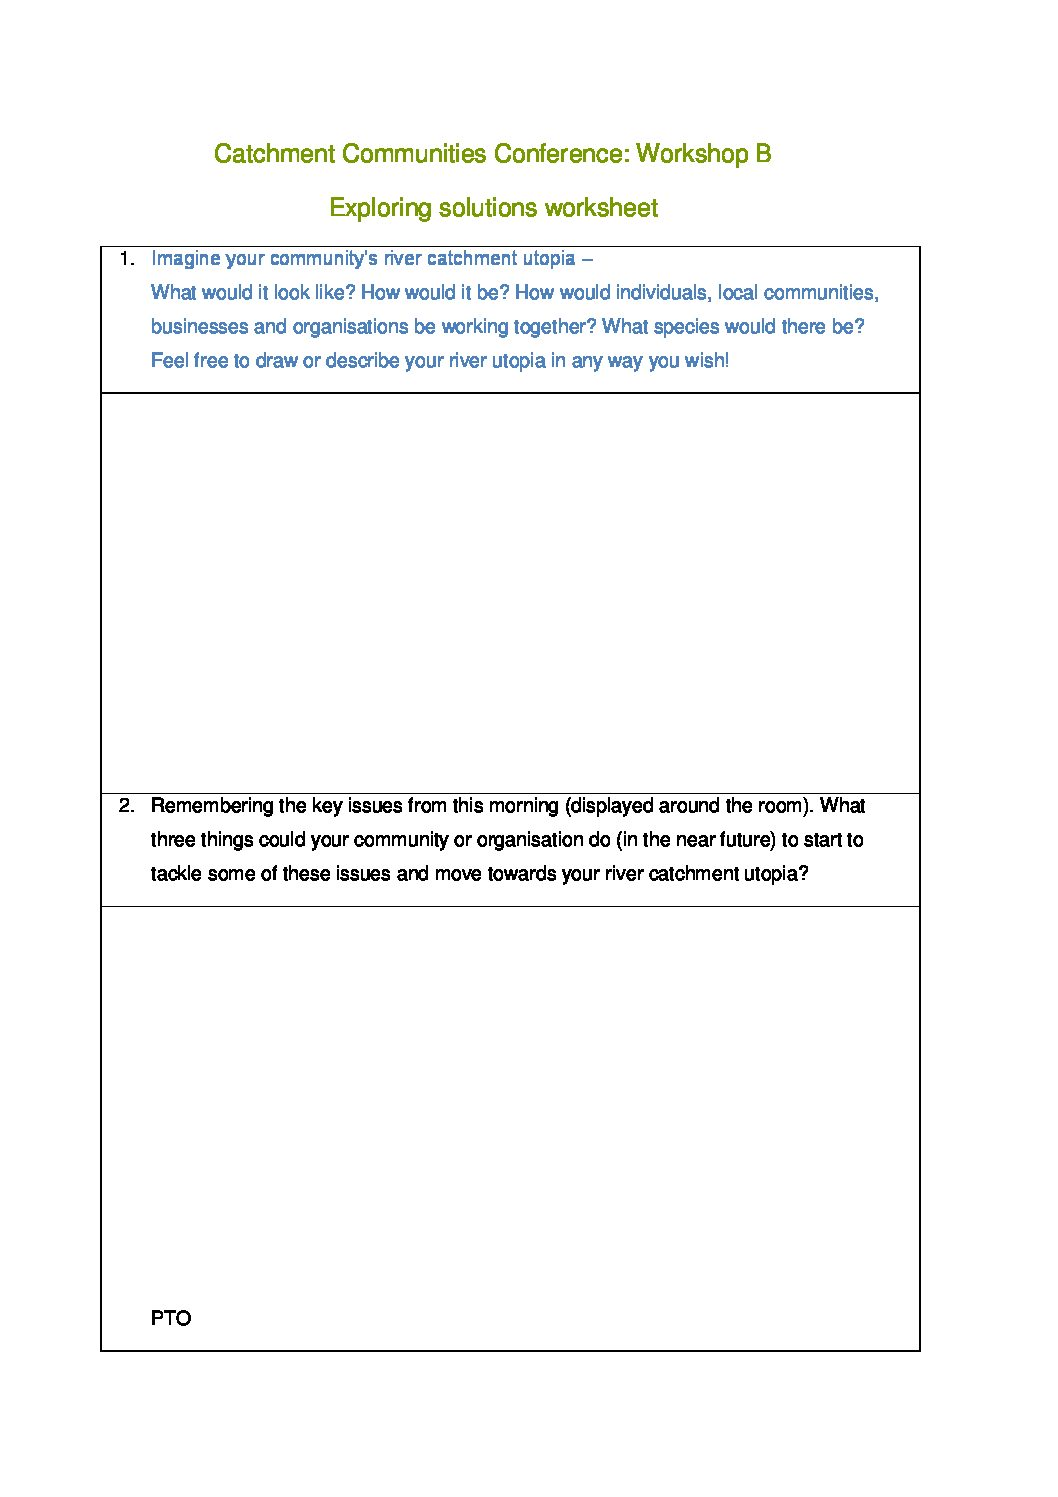 Workshop B Worksheet